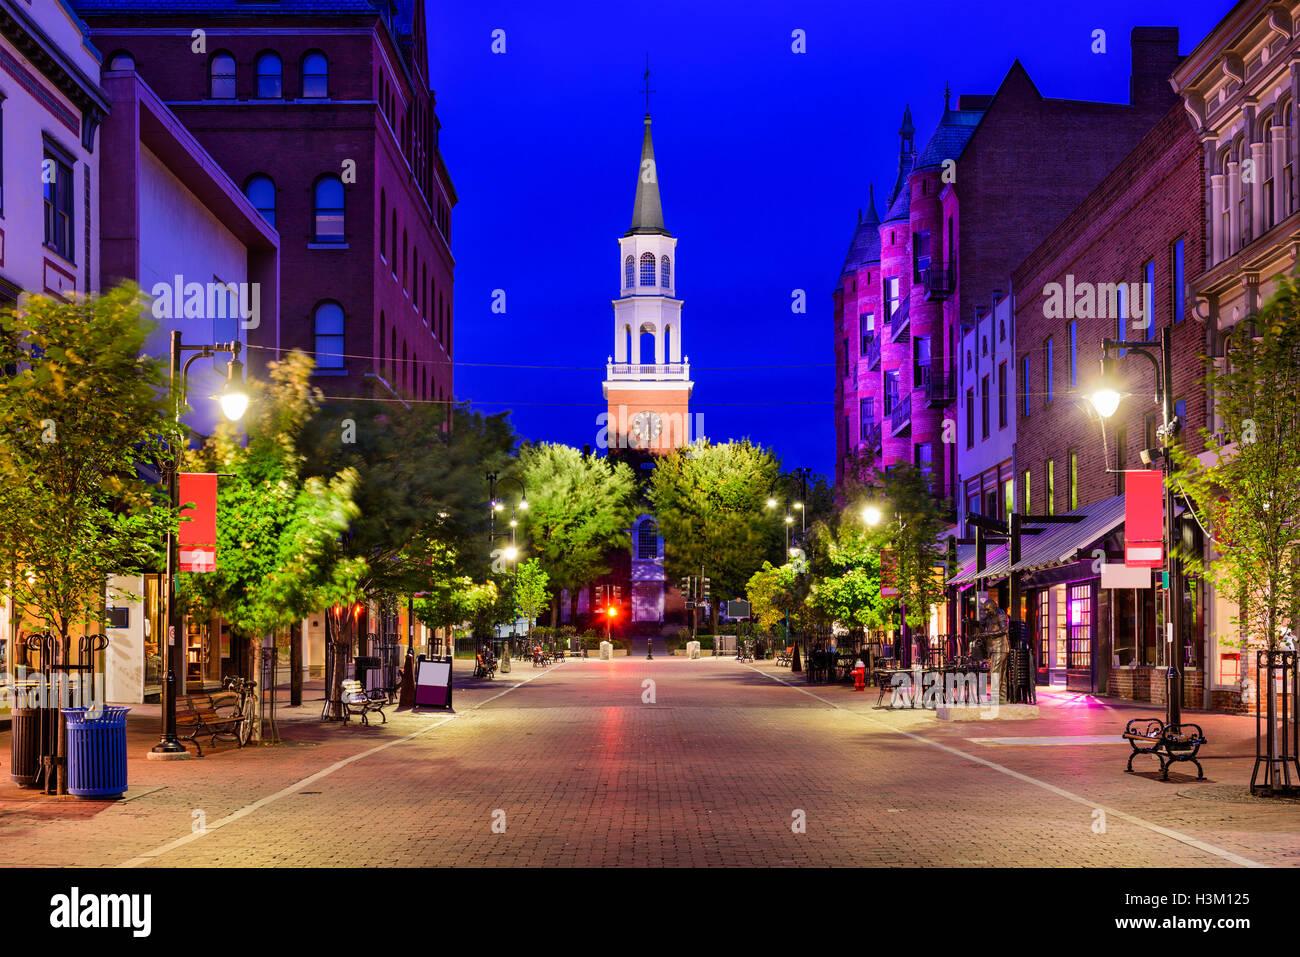 Burlington, Vermont, USA at Church Street Marketplace. - Stock Image